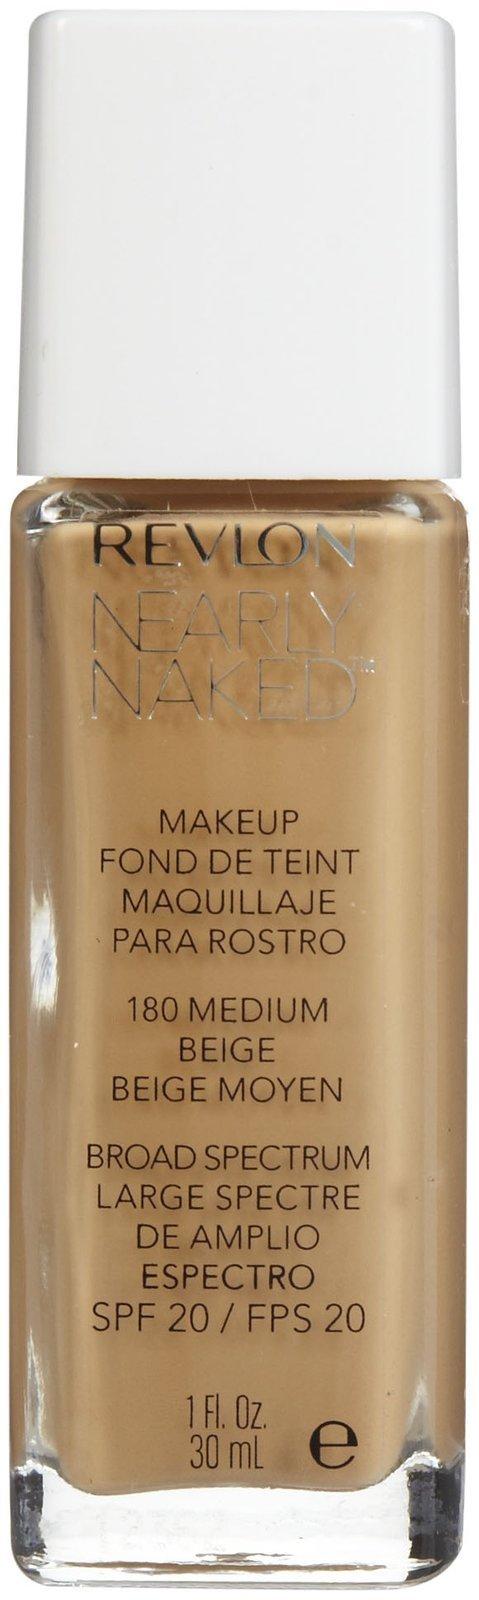 Revlon Nearly Naked Makeup - Medium Beige - 1 oz